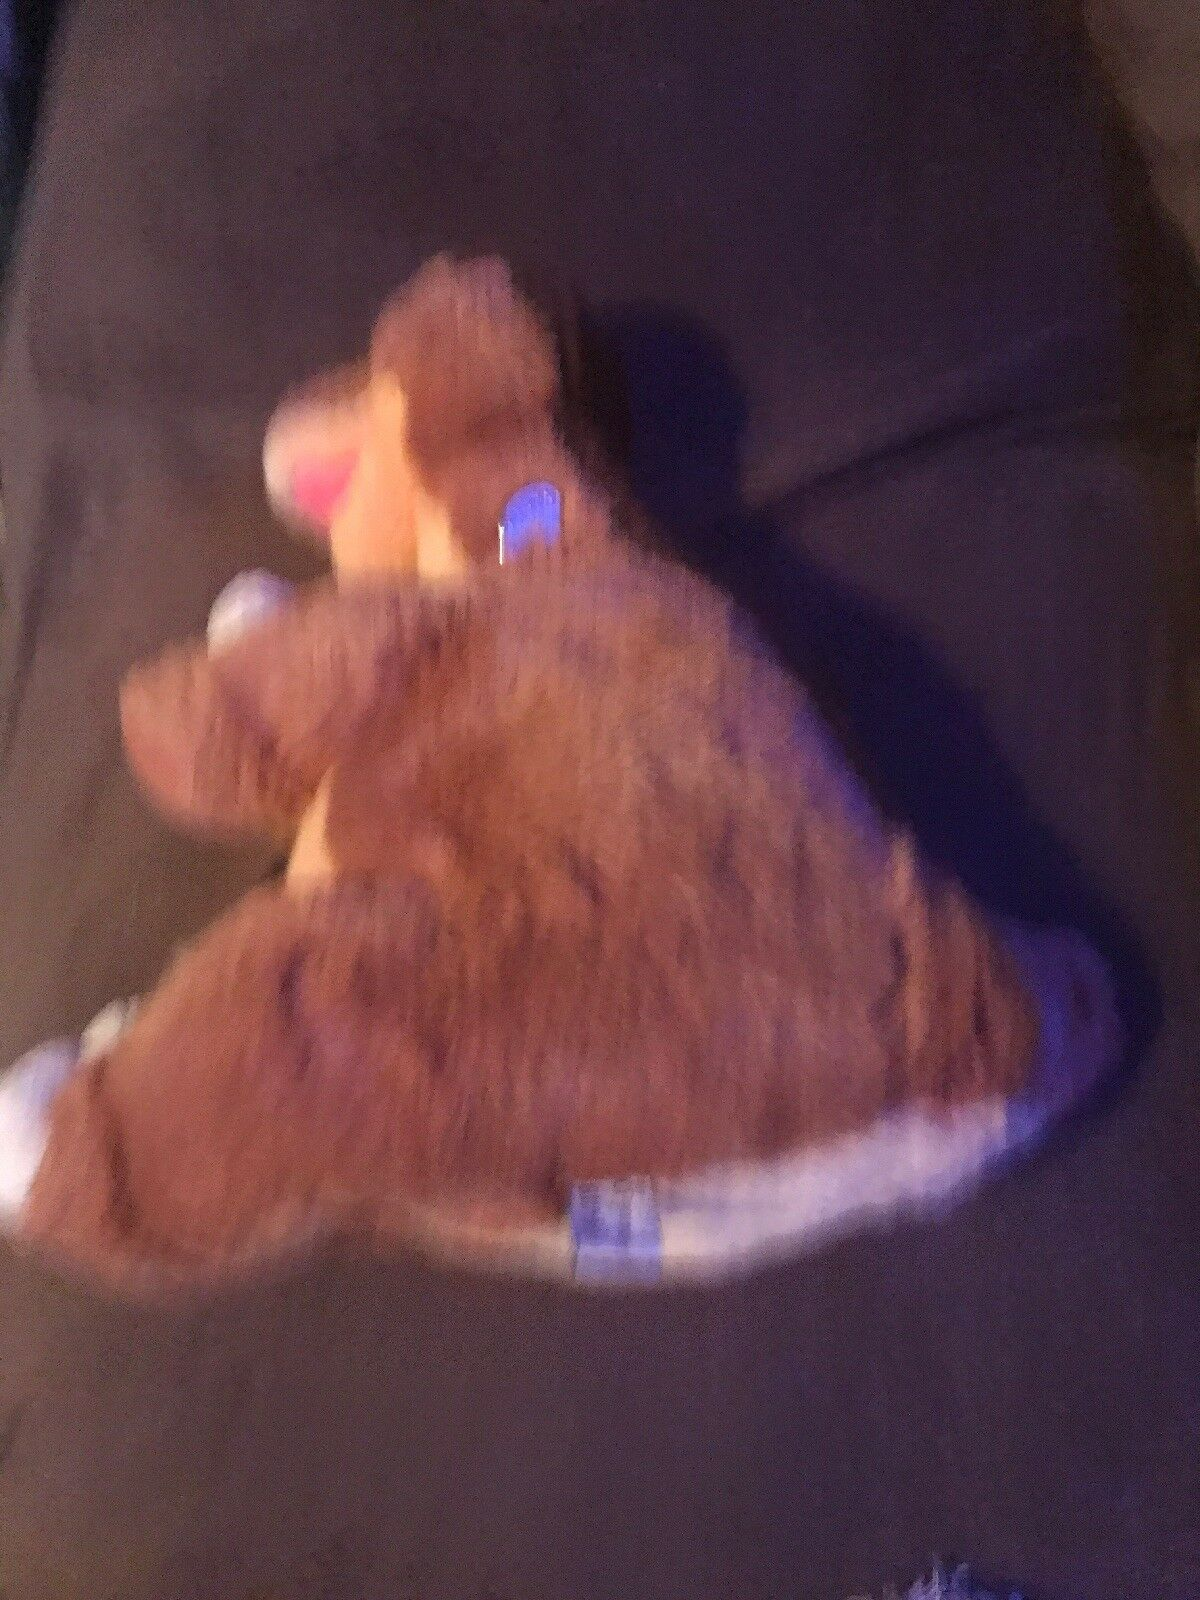 1988 Gund Littlefoot Land Land Land Before Time Dinosaur Stuffed Animal Plush VINTAGE RARE 6886fa